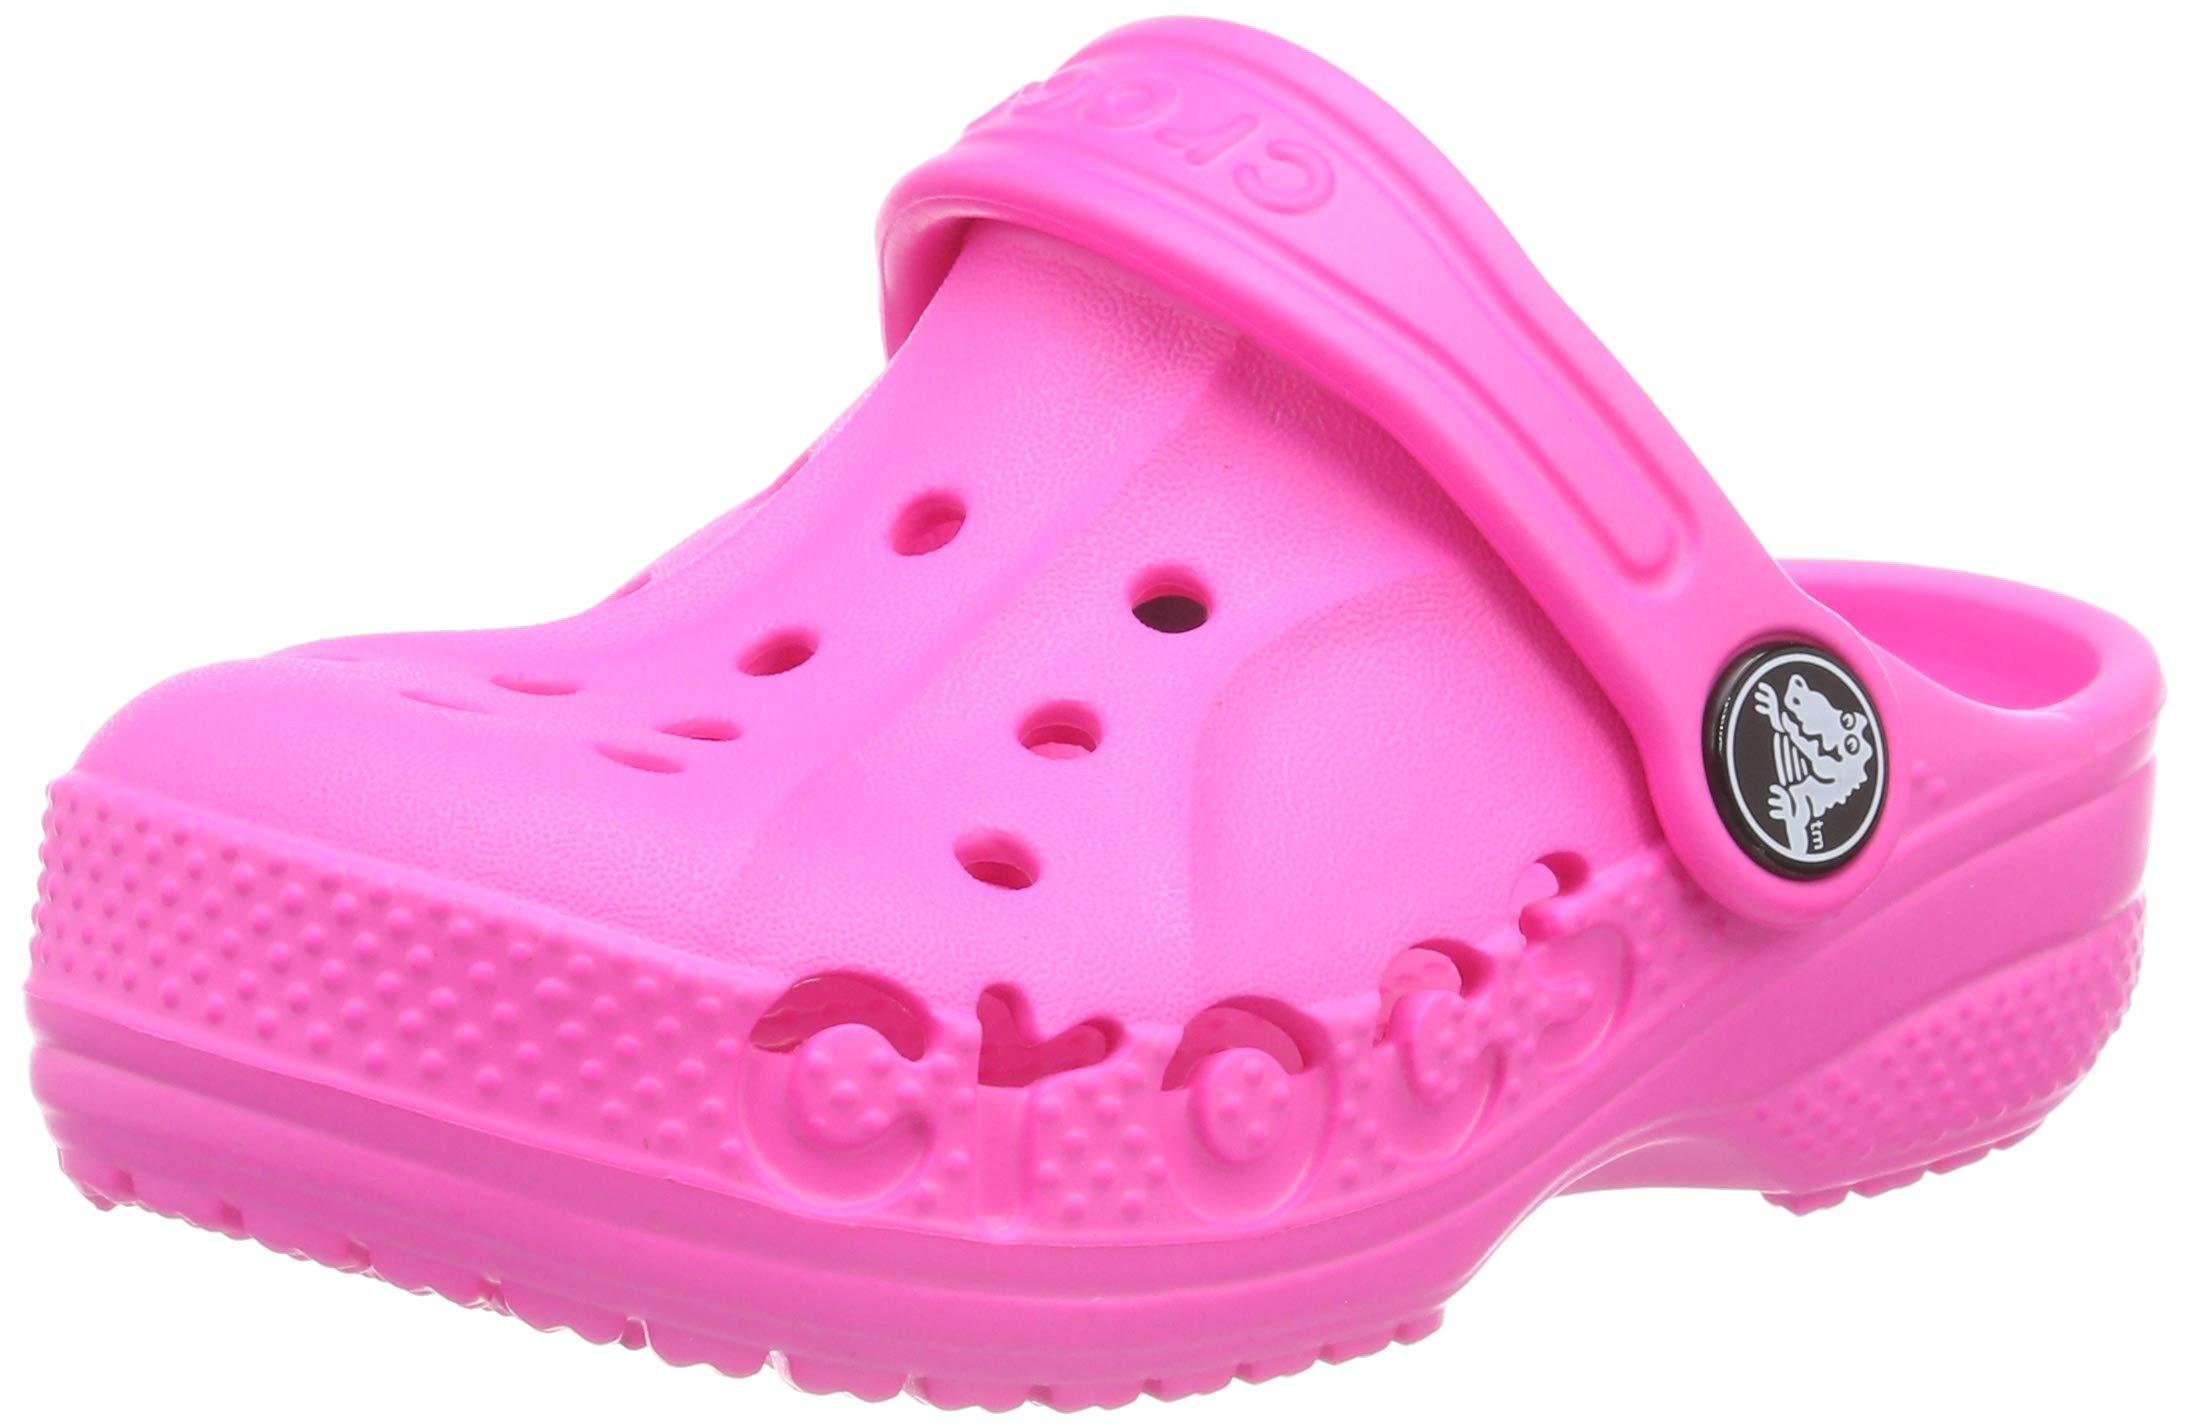 Crocs Kids' Baya Clog | Comfortable